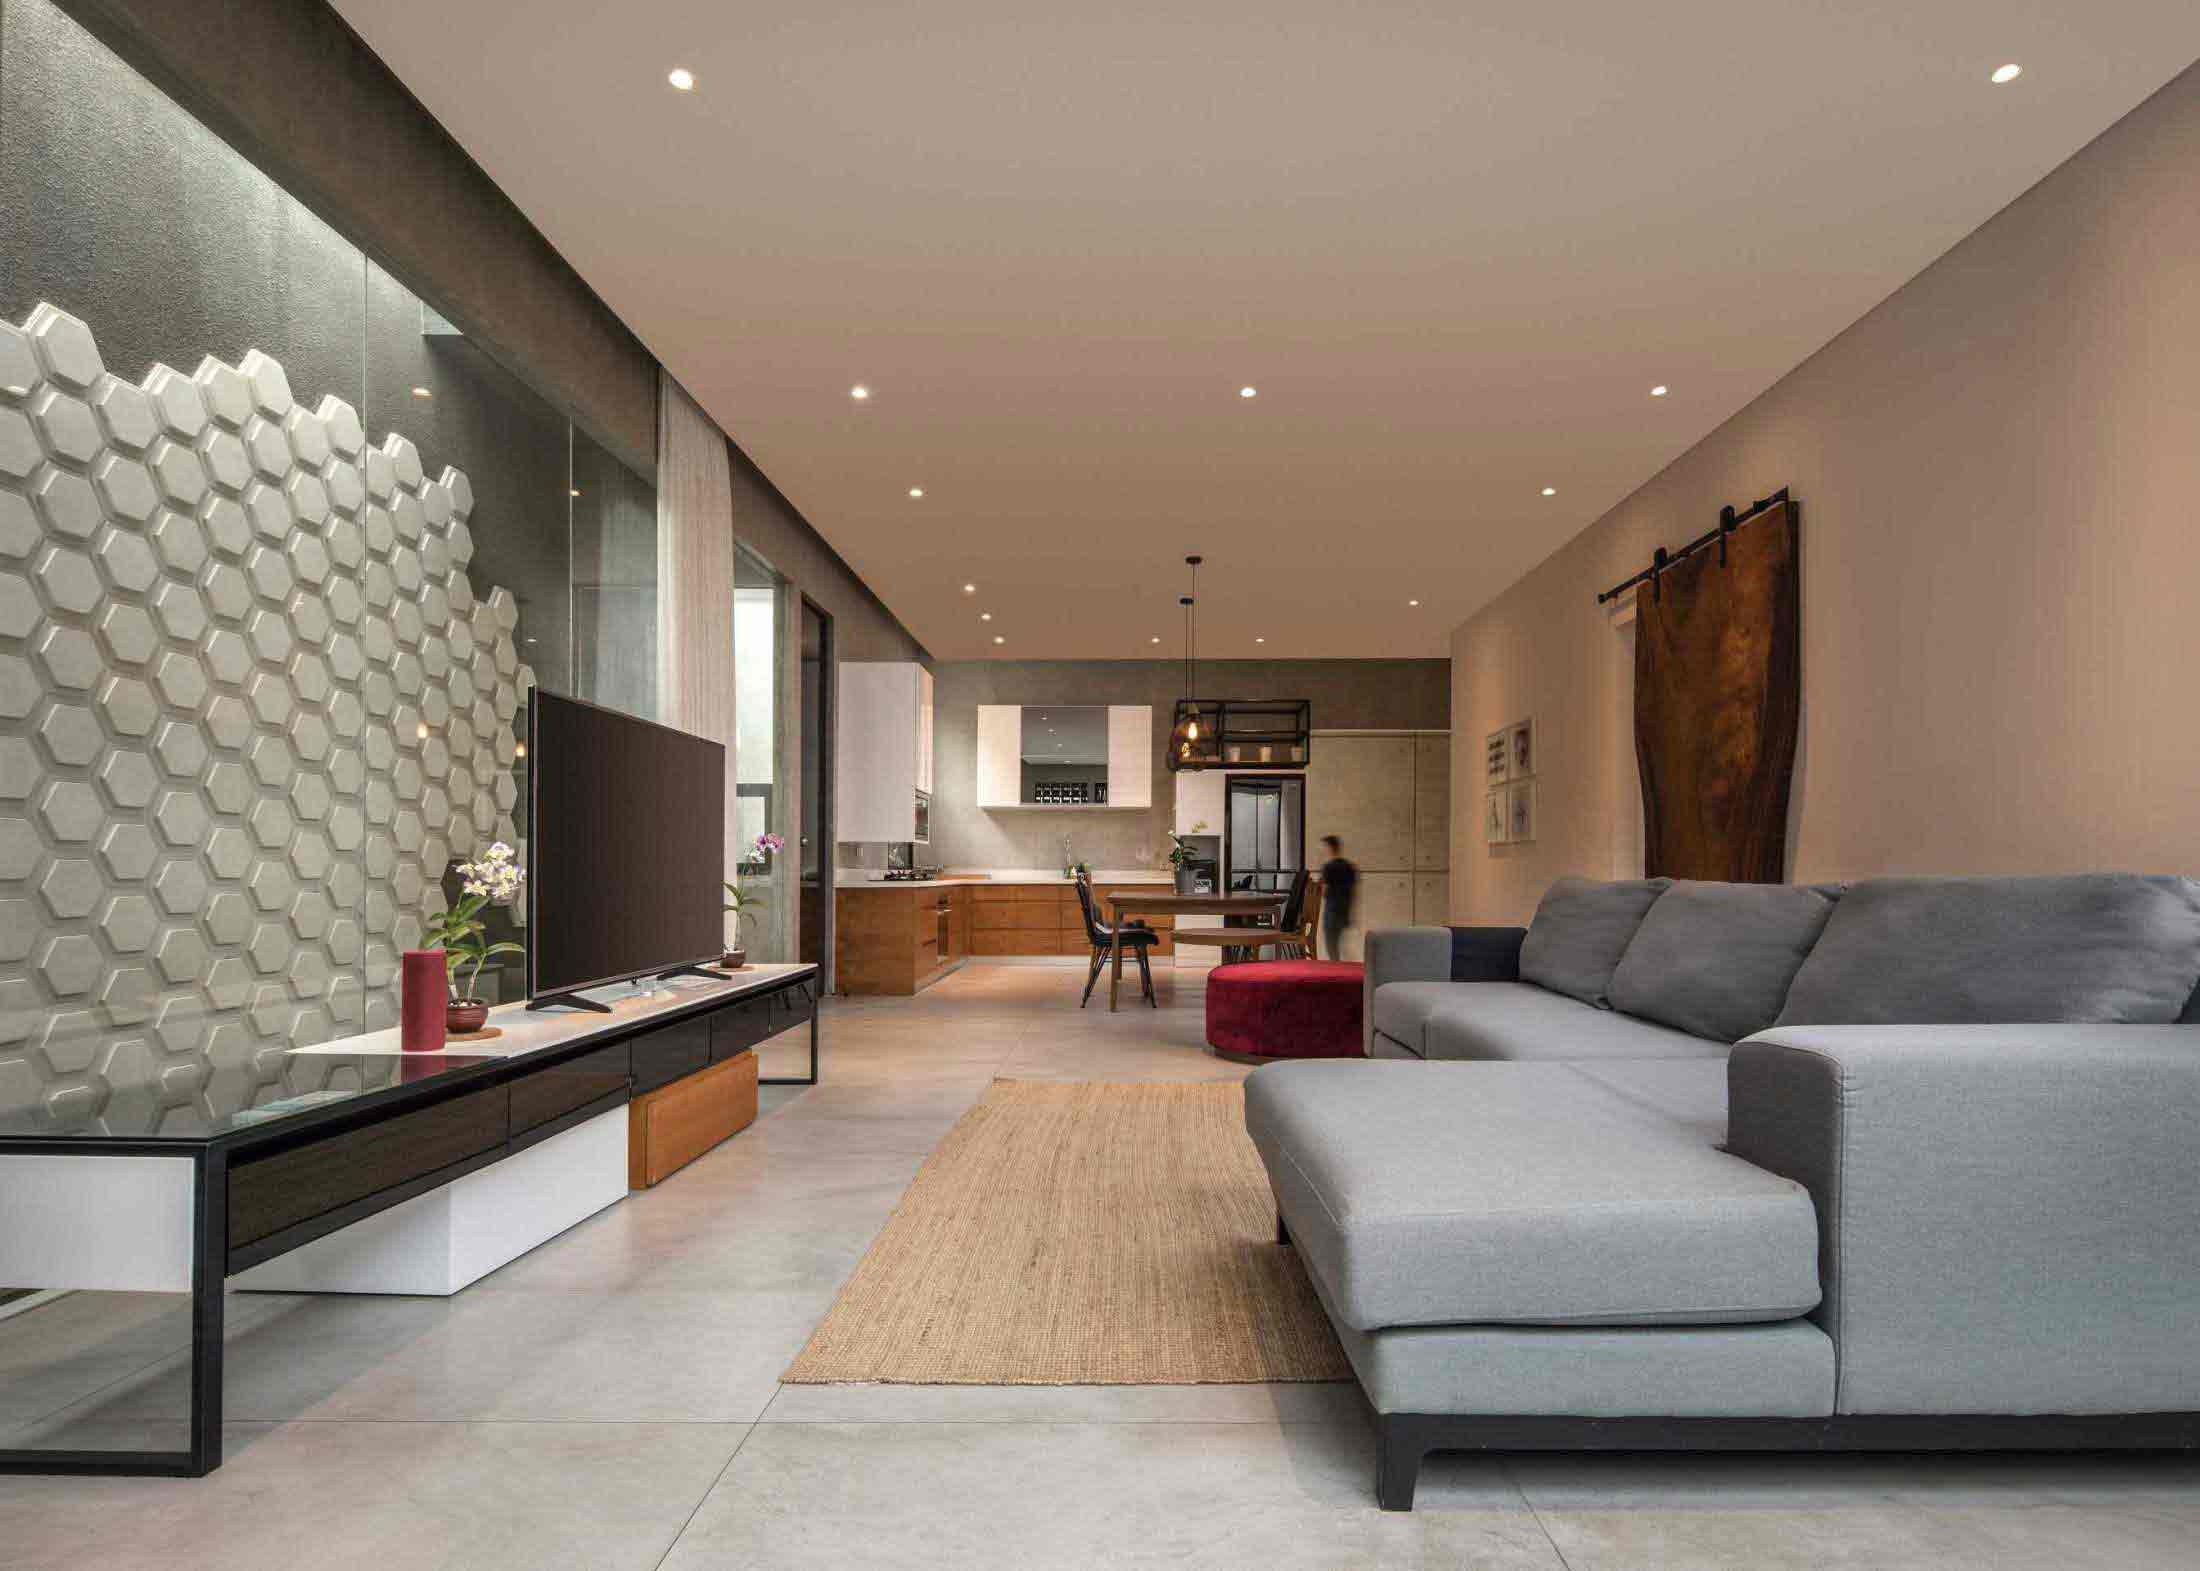 Desain Rumah Minimalis Dengan Permainan Pola Artistik Ala Jxa Studio Arsitag